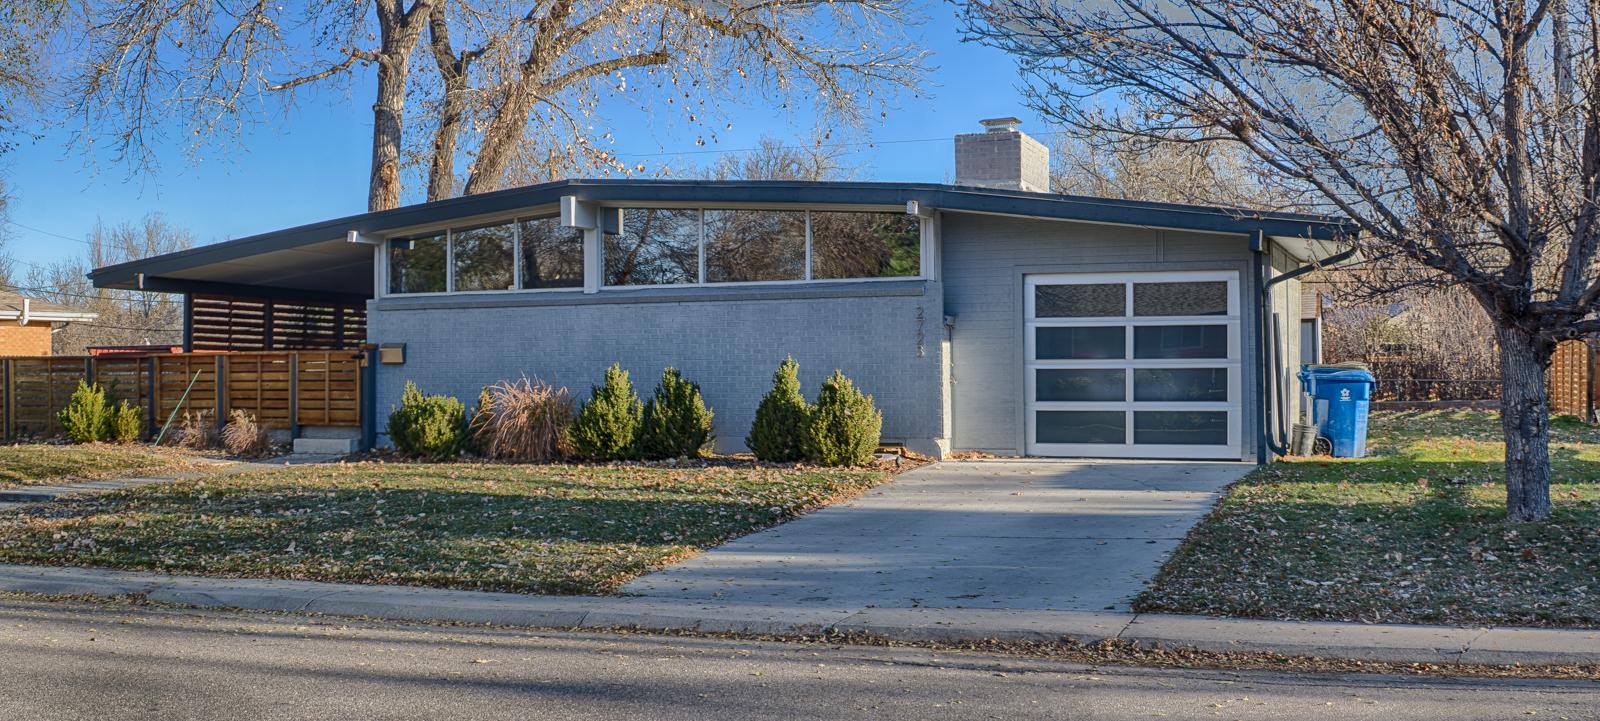 Adrian-Kinney-Dream-House-Acres-11.jpg